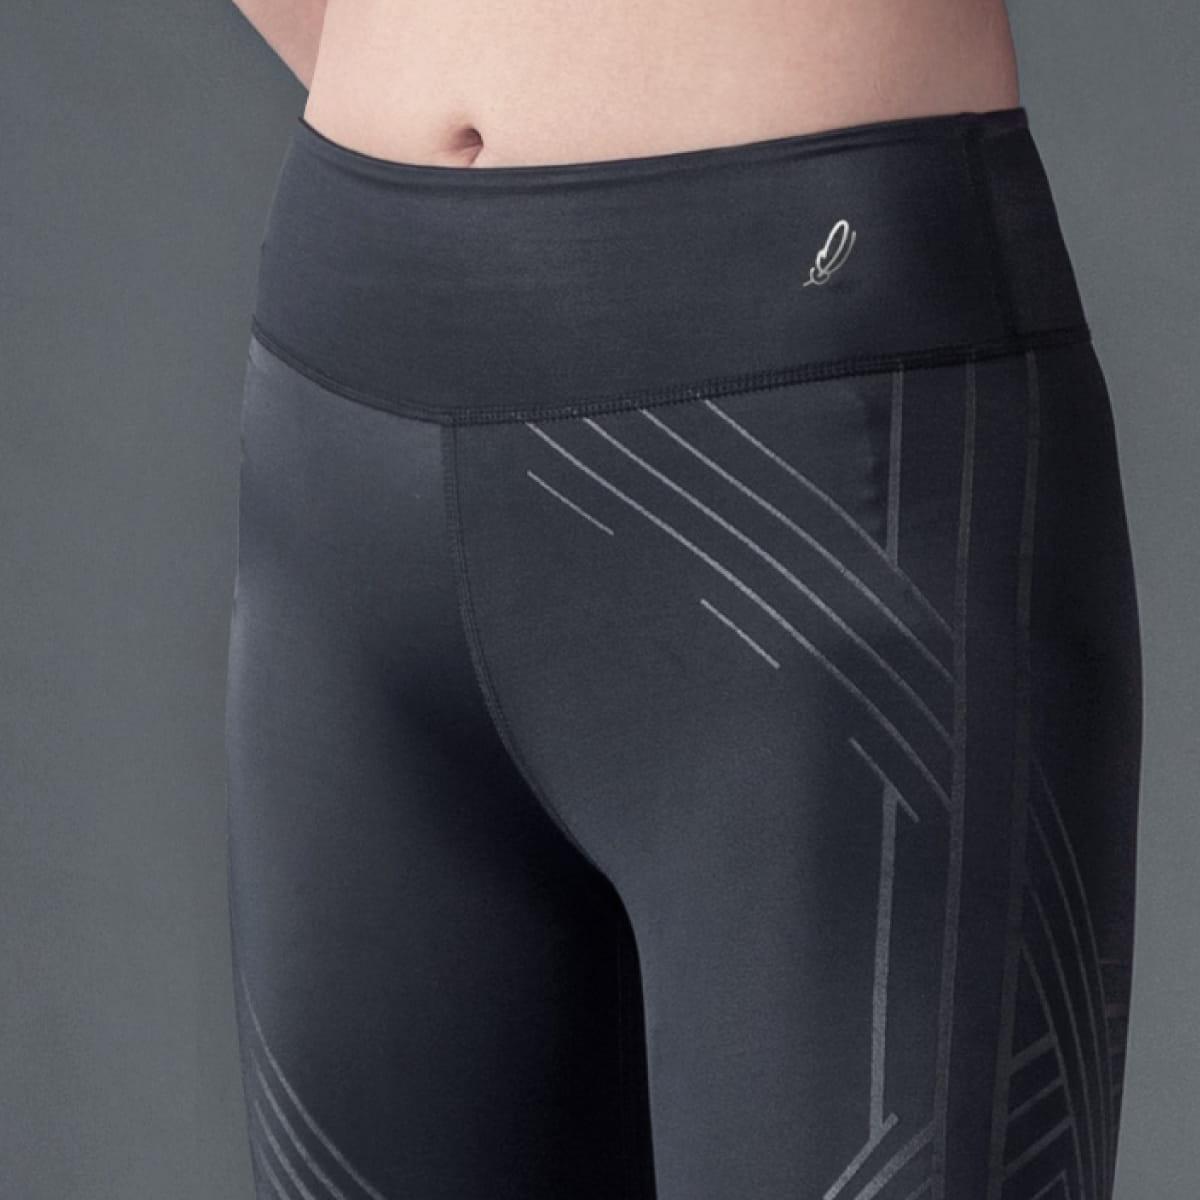 TENO超彈感美型健身褲-Track軌跡 11